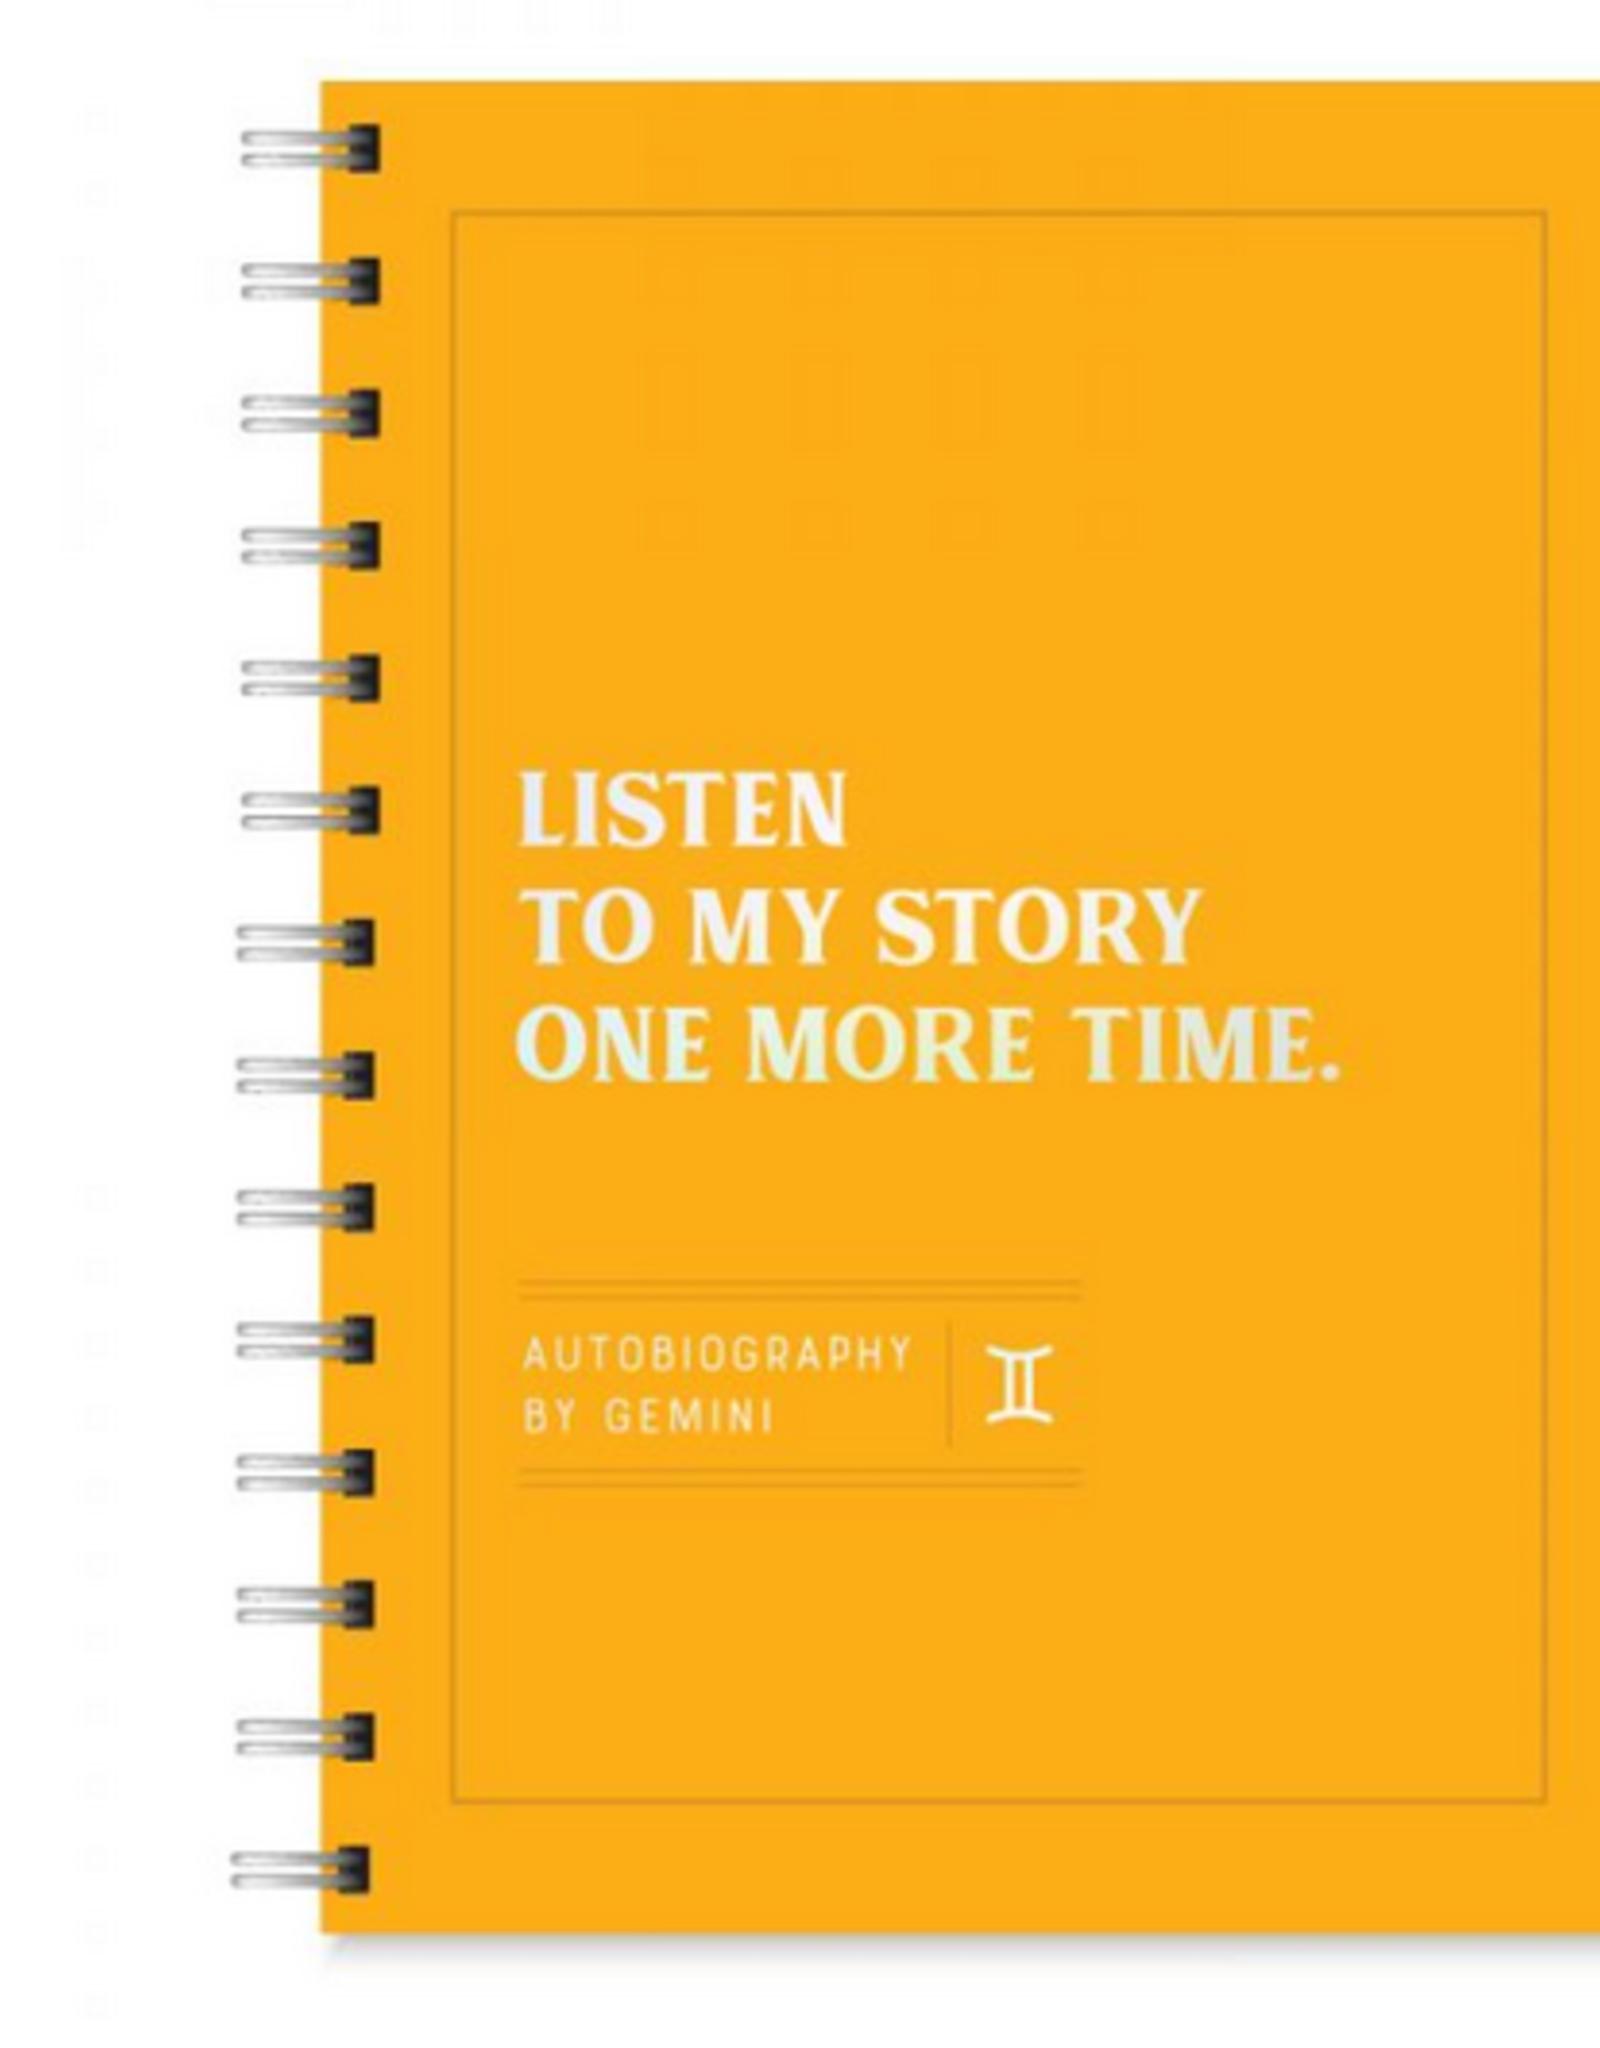 Gemini Autobiography Journal